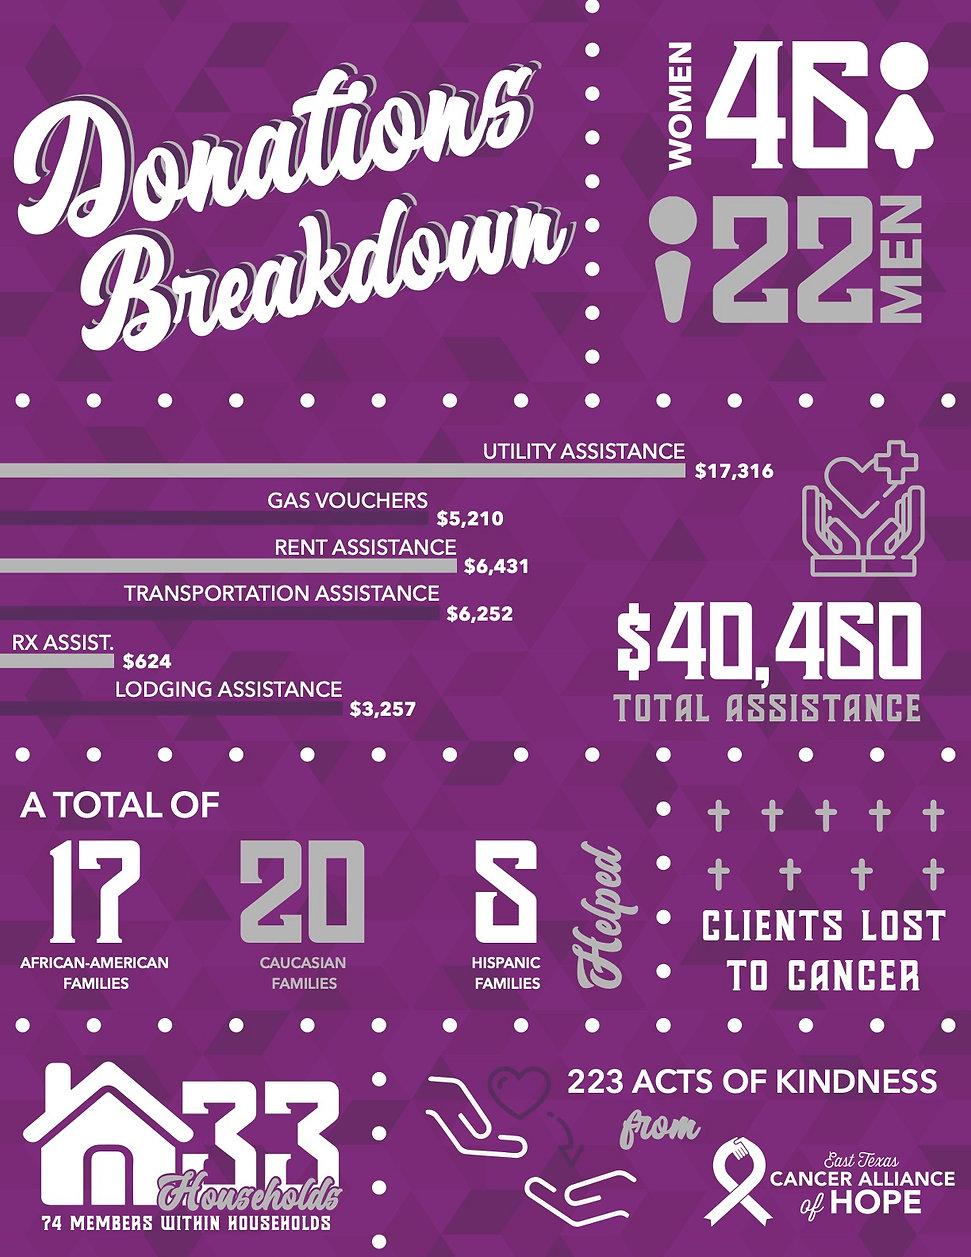 ETCAH Stats Info Graphic.jpg